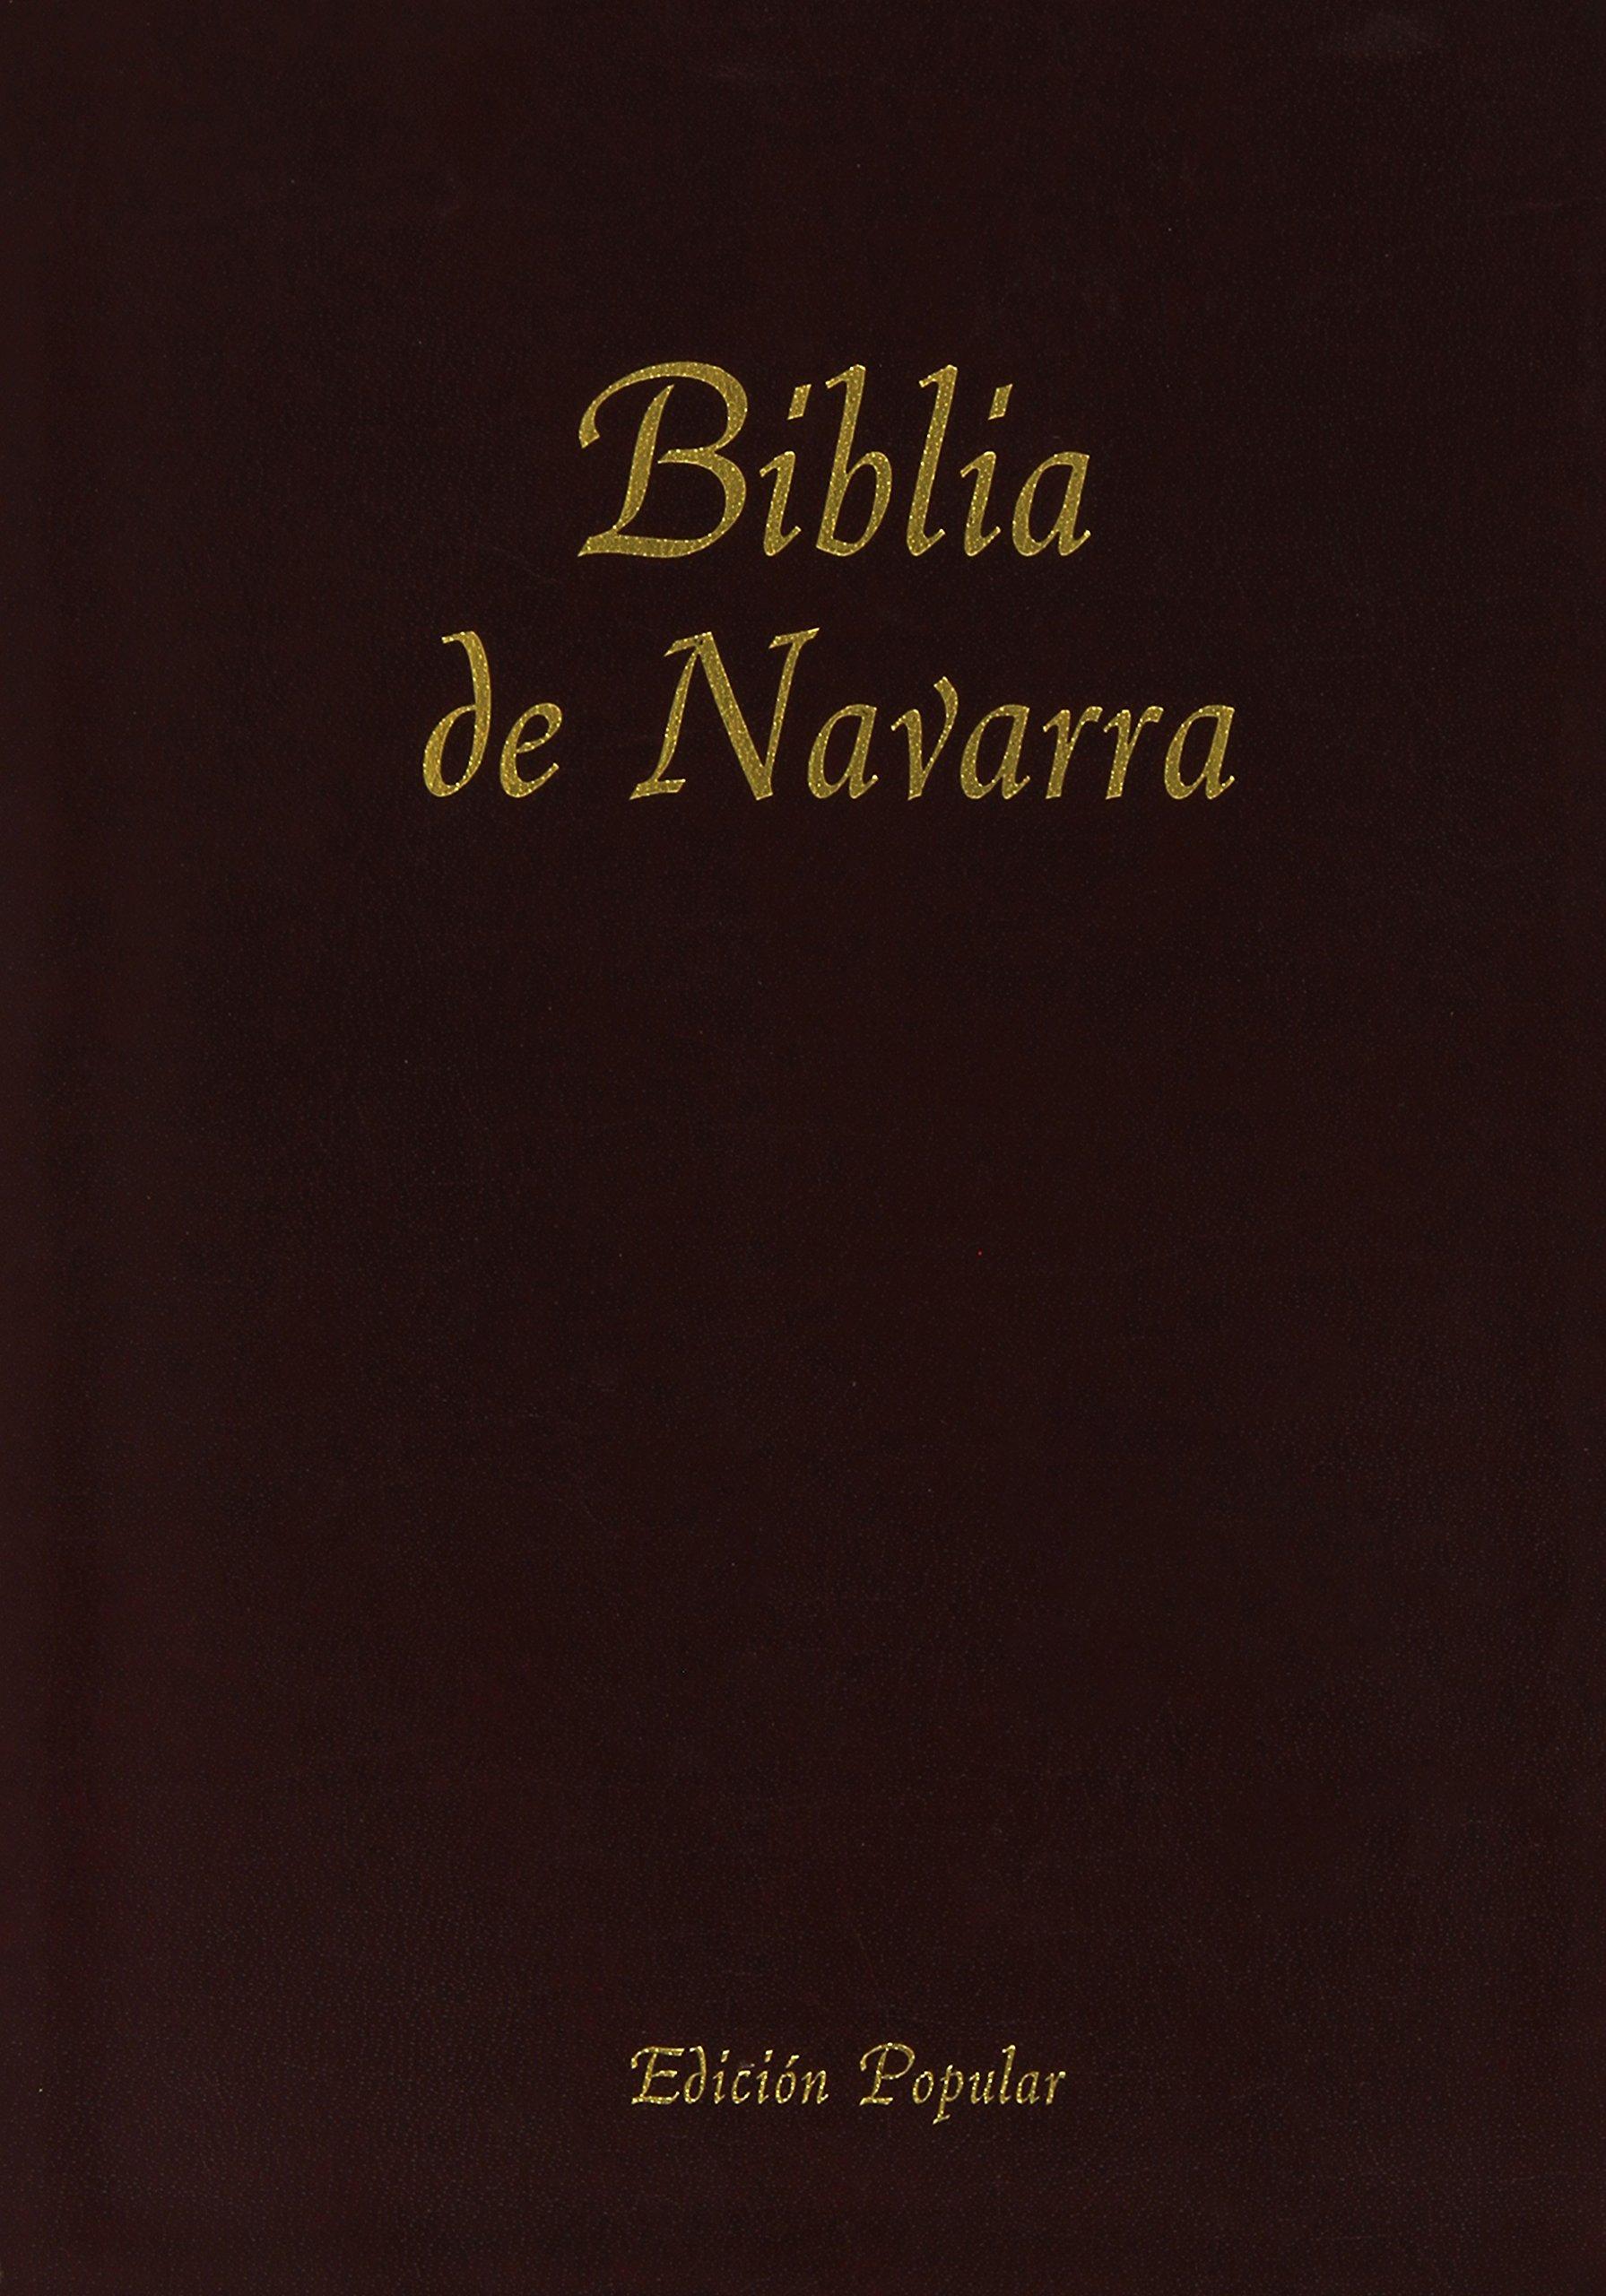 Biblia De Navarra (Encuadernada En Piel): 9781890177706: Amazon.com: Books